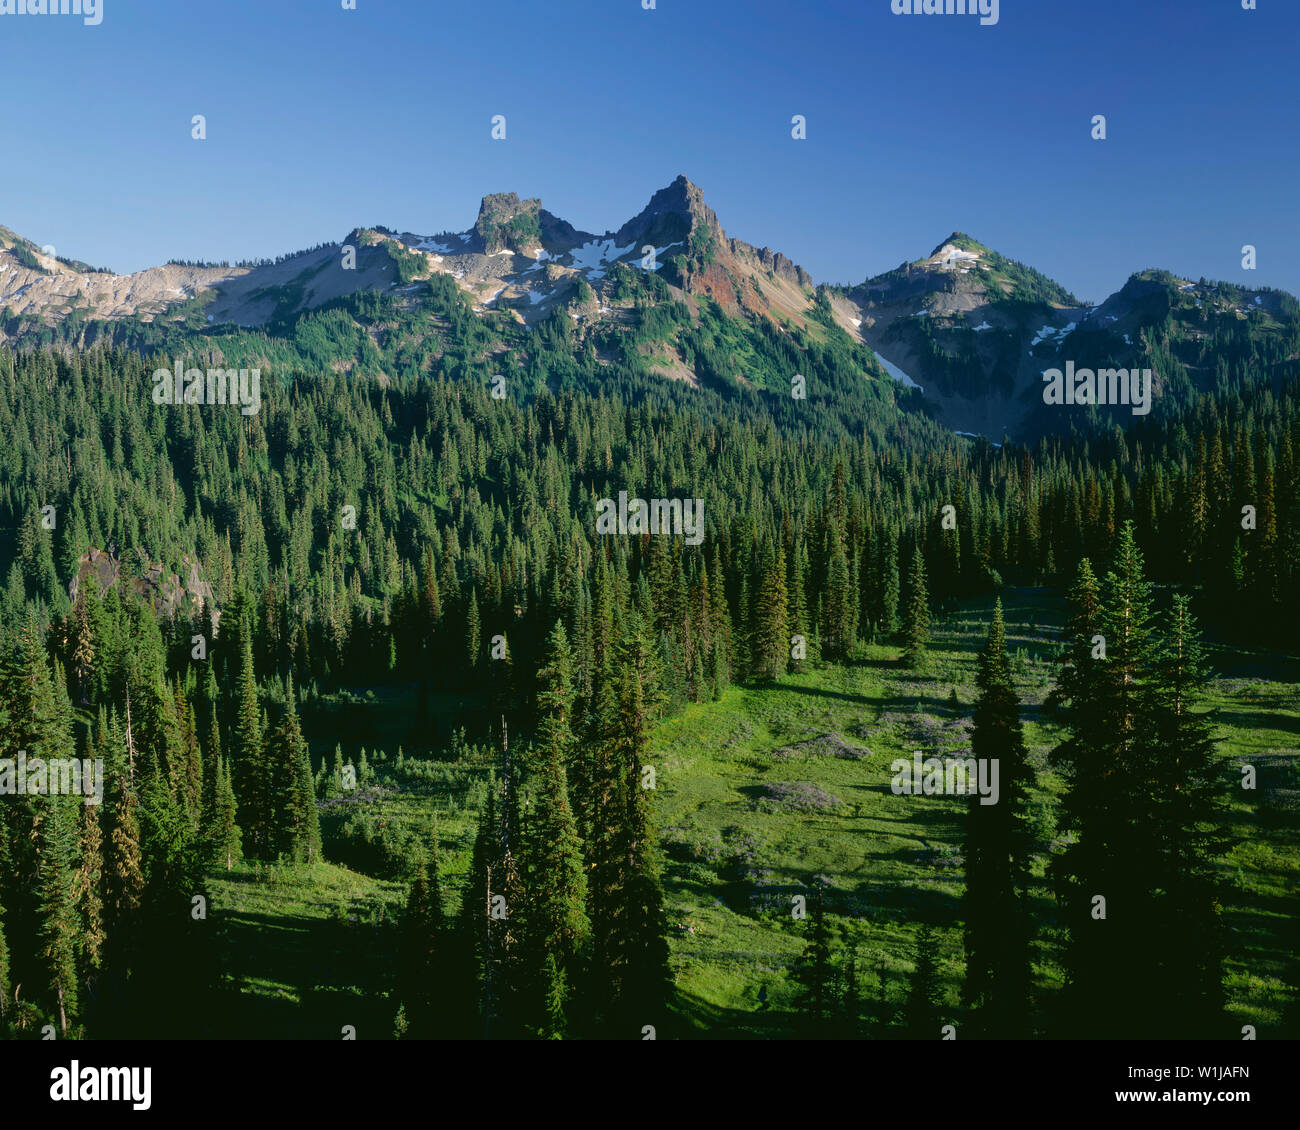 USA, Washington, Mt. Rainier National Park,  Peaks of the Tatoosh Range overlook lush meadows and coniferous forest below Paradise area. - Stock Image